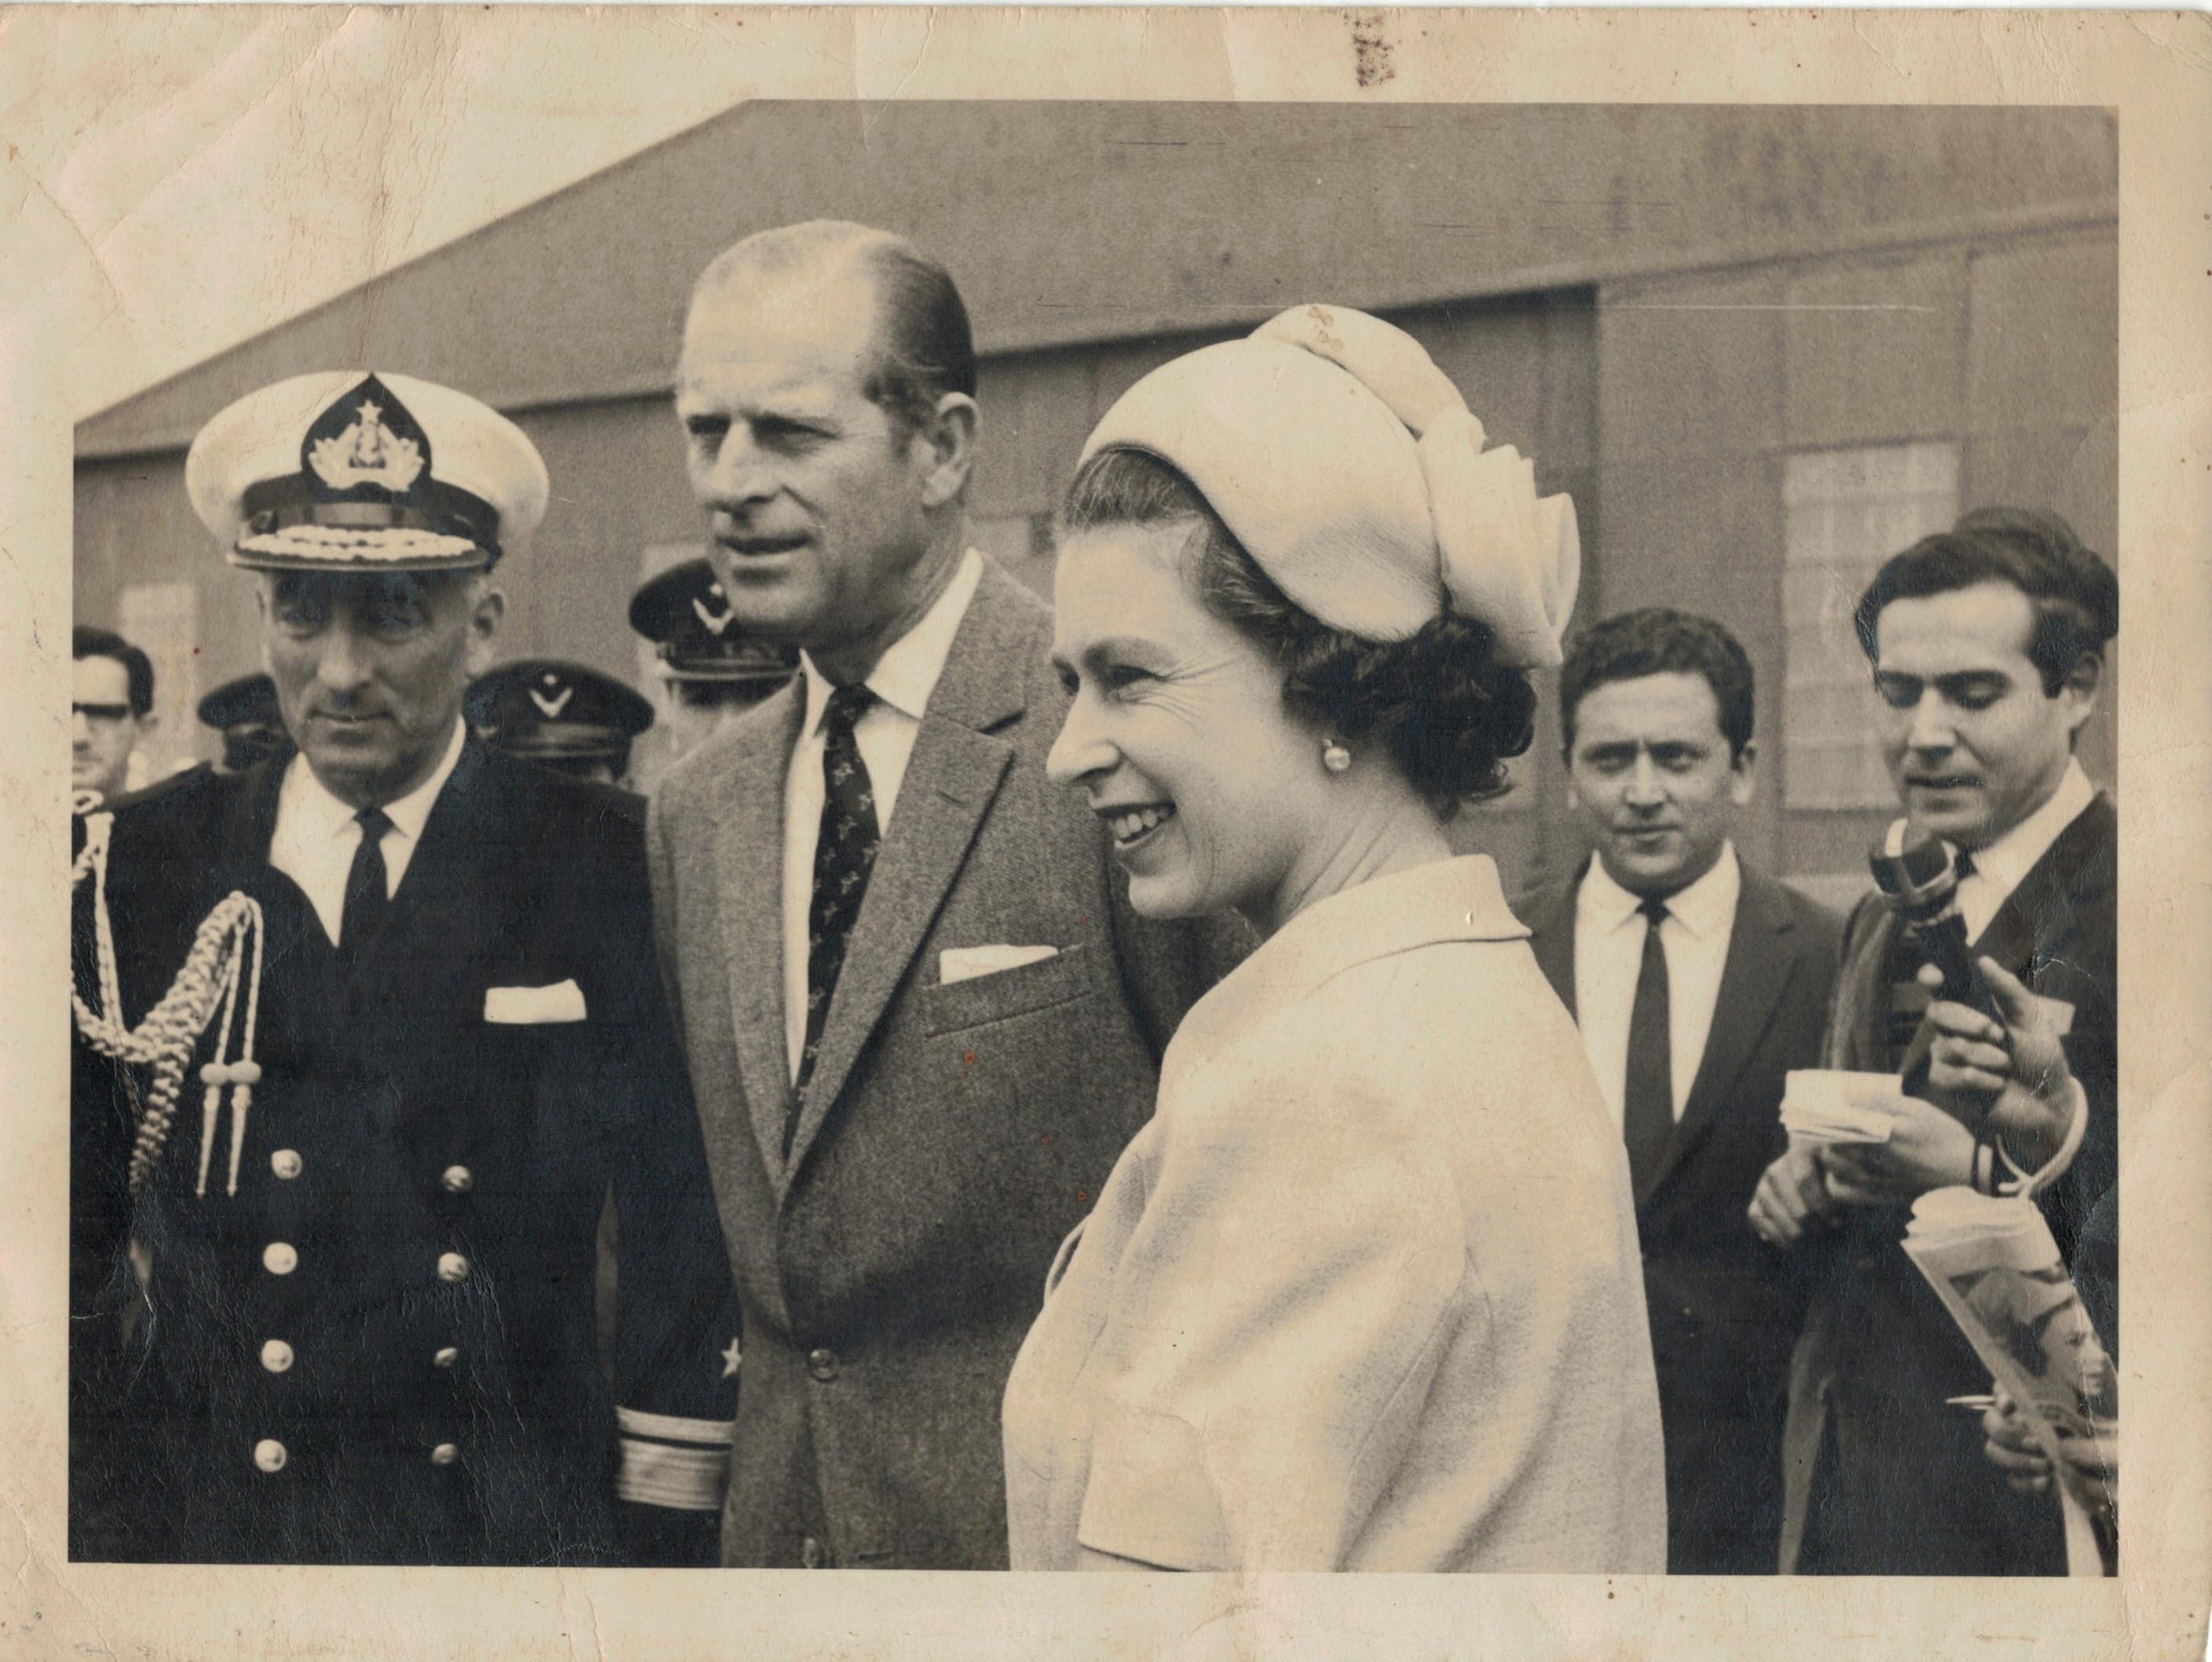 Enterreno - Fotos históricas de chile - fotos antiguas de Chile - Reina Isabel en Base Aérea de Quintero, 1968